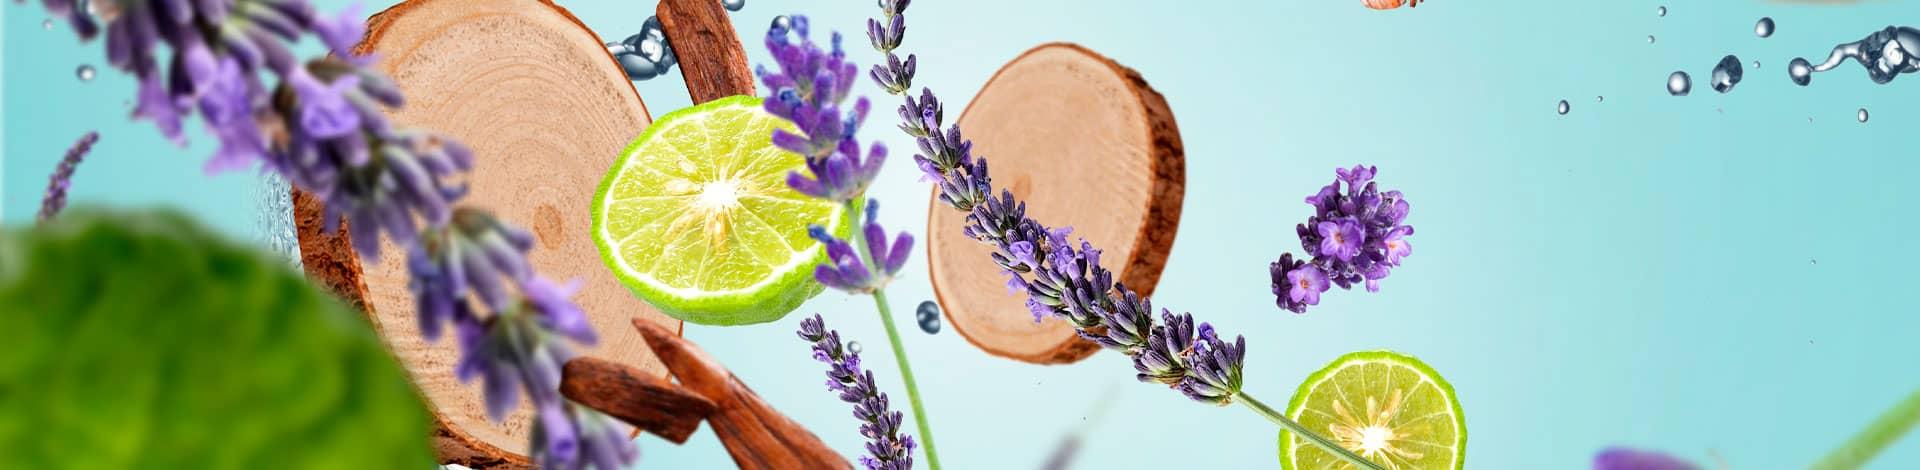 Amaderada fresca aroma fresco